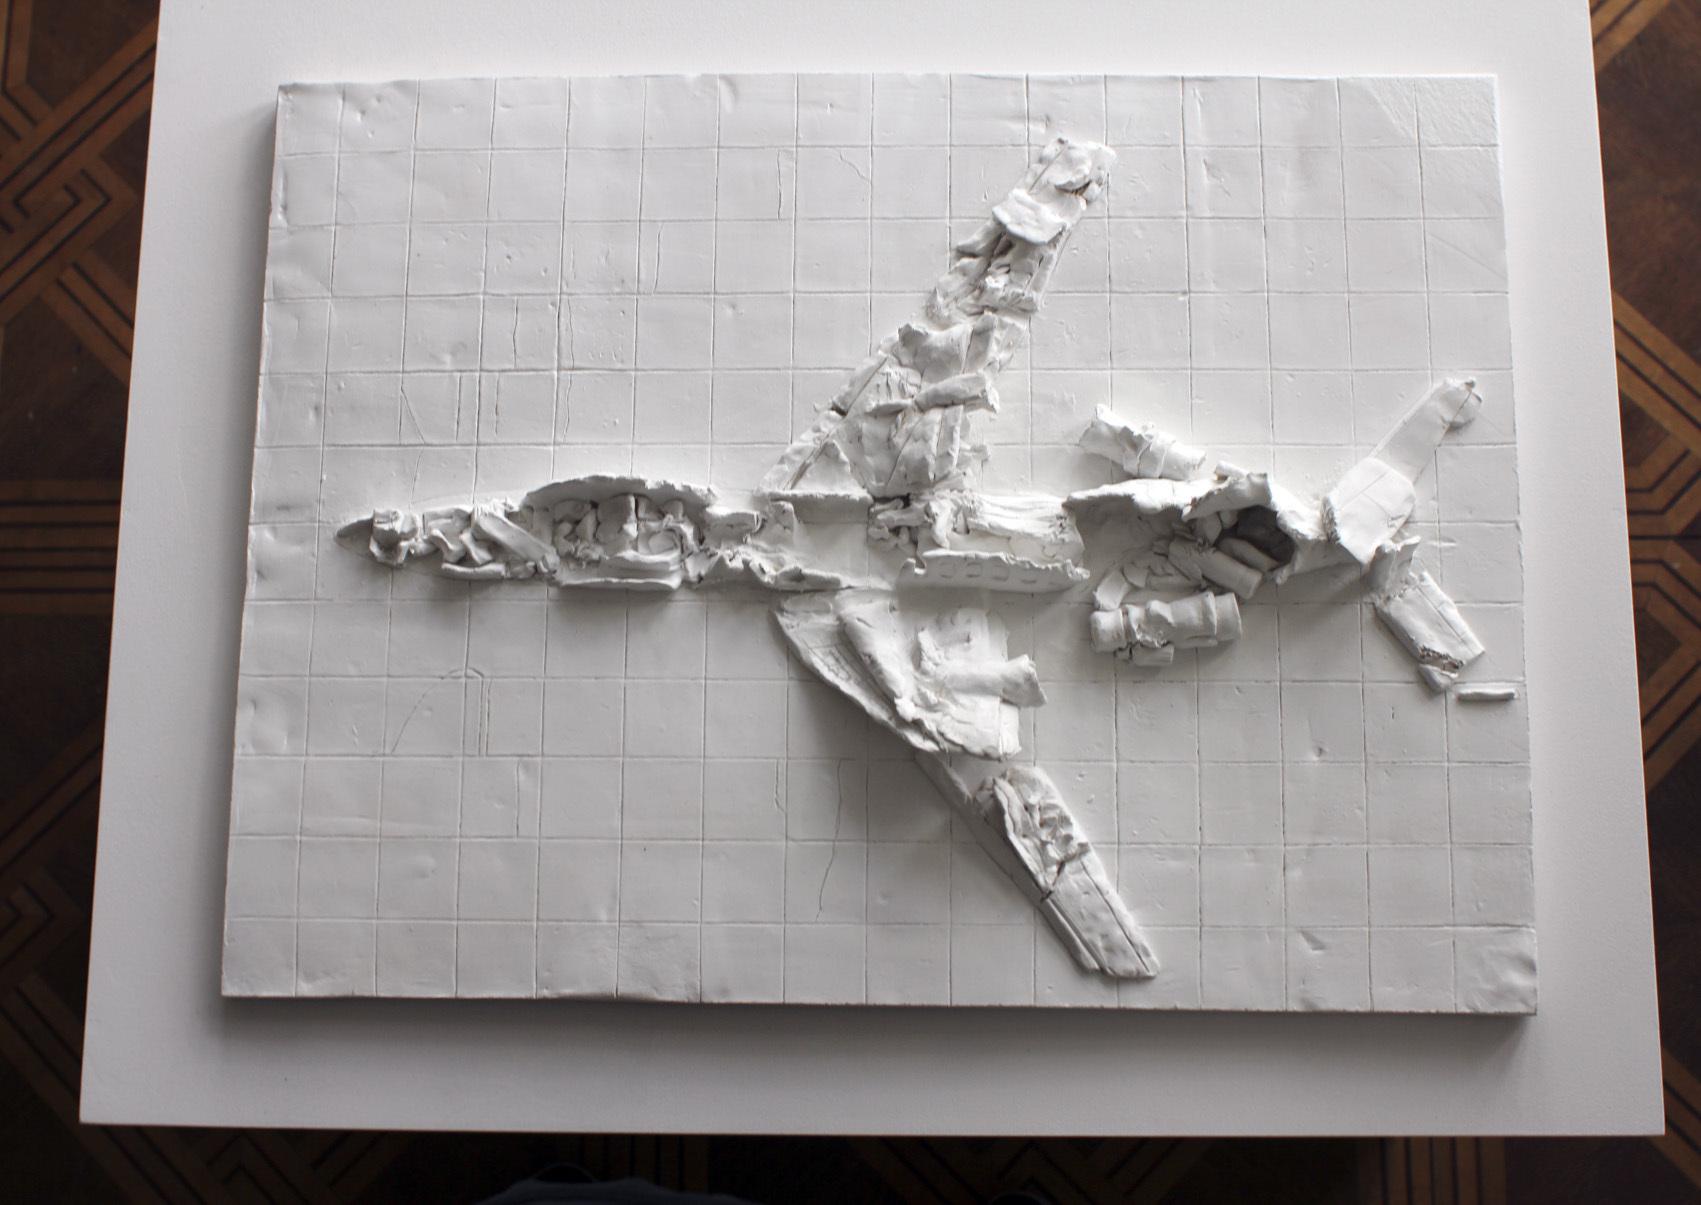 Christoph Draeger, Untitled (Smolensk), 2014 r., rzezba ceramiczna wglinie